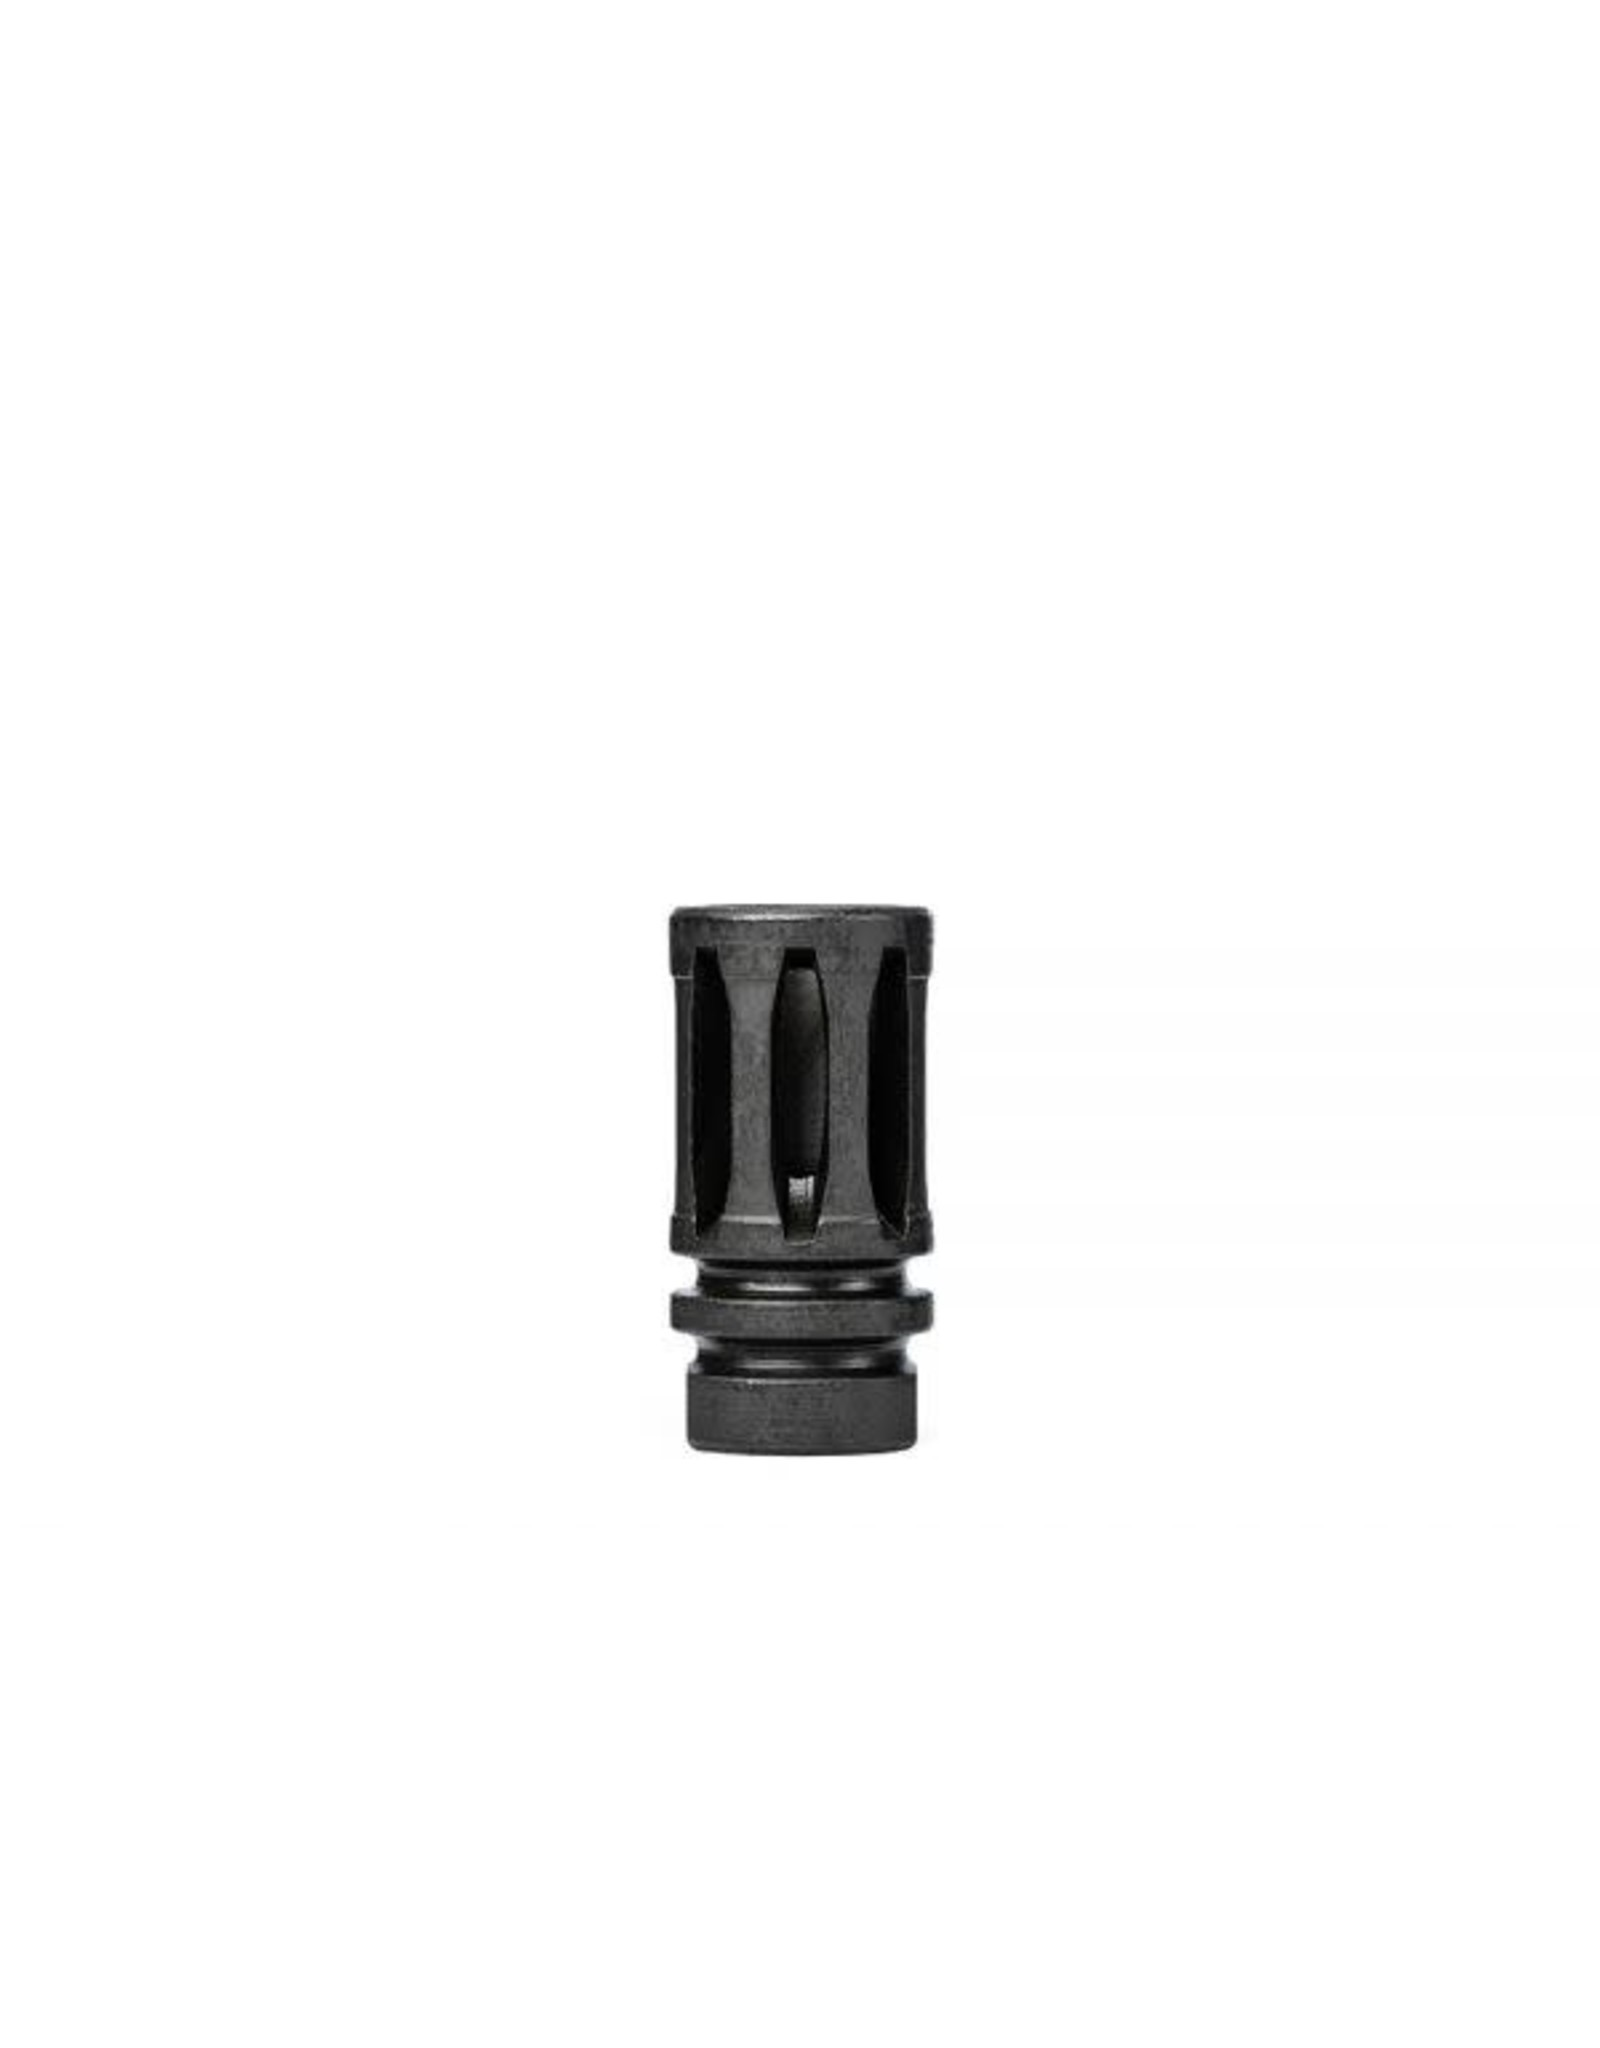 AR 308 A2 Birdcage Flash Hider 5/8x24